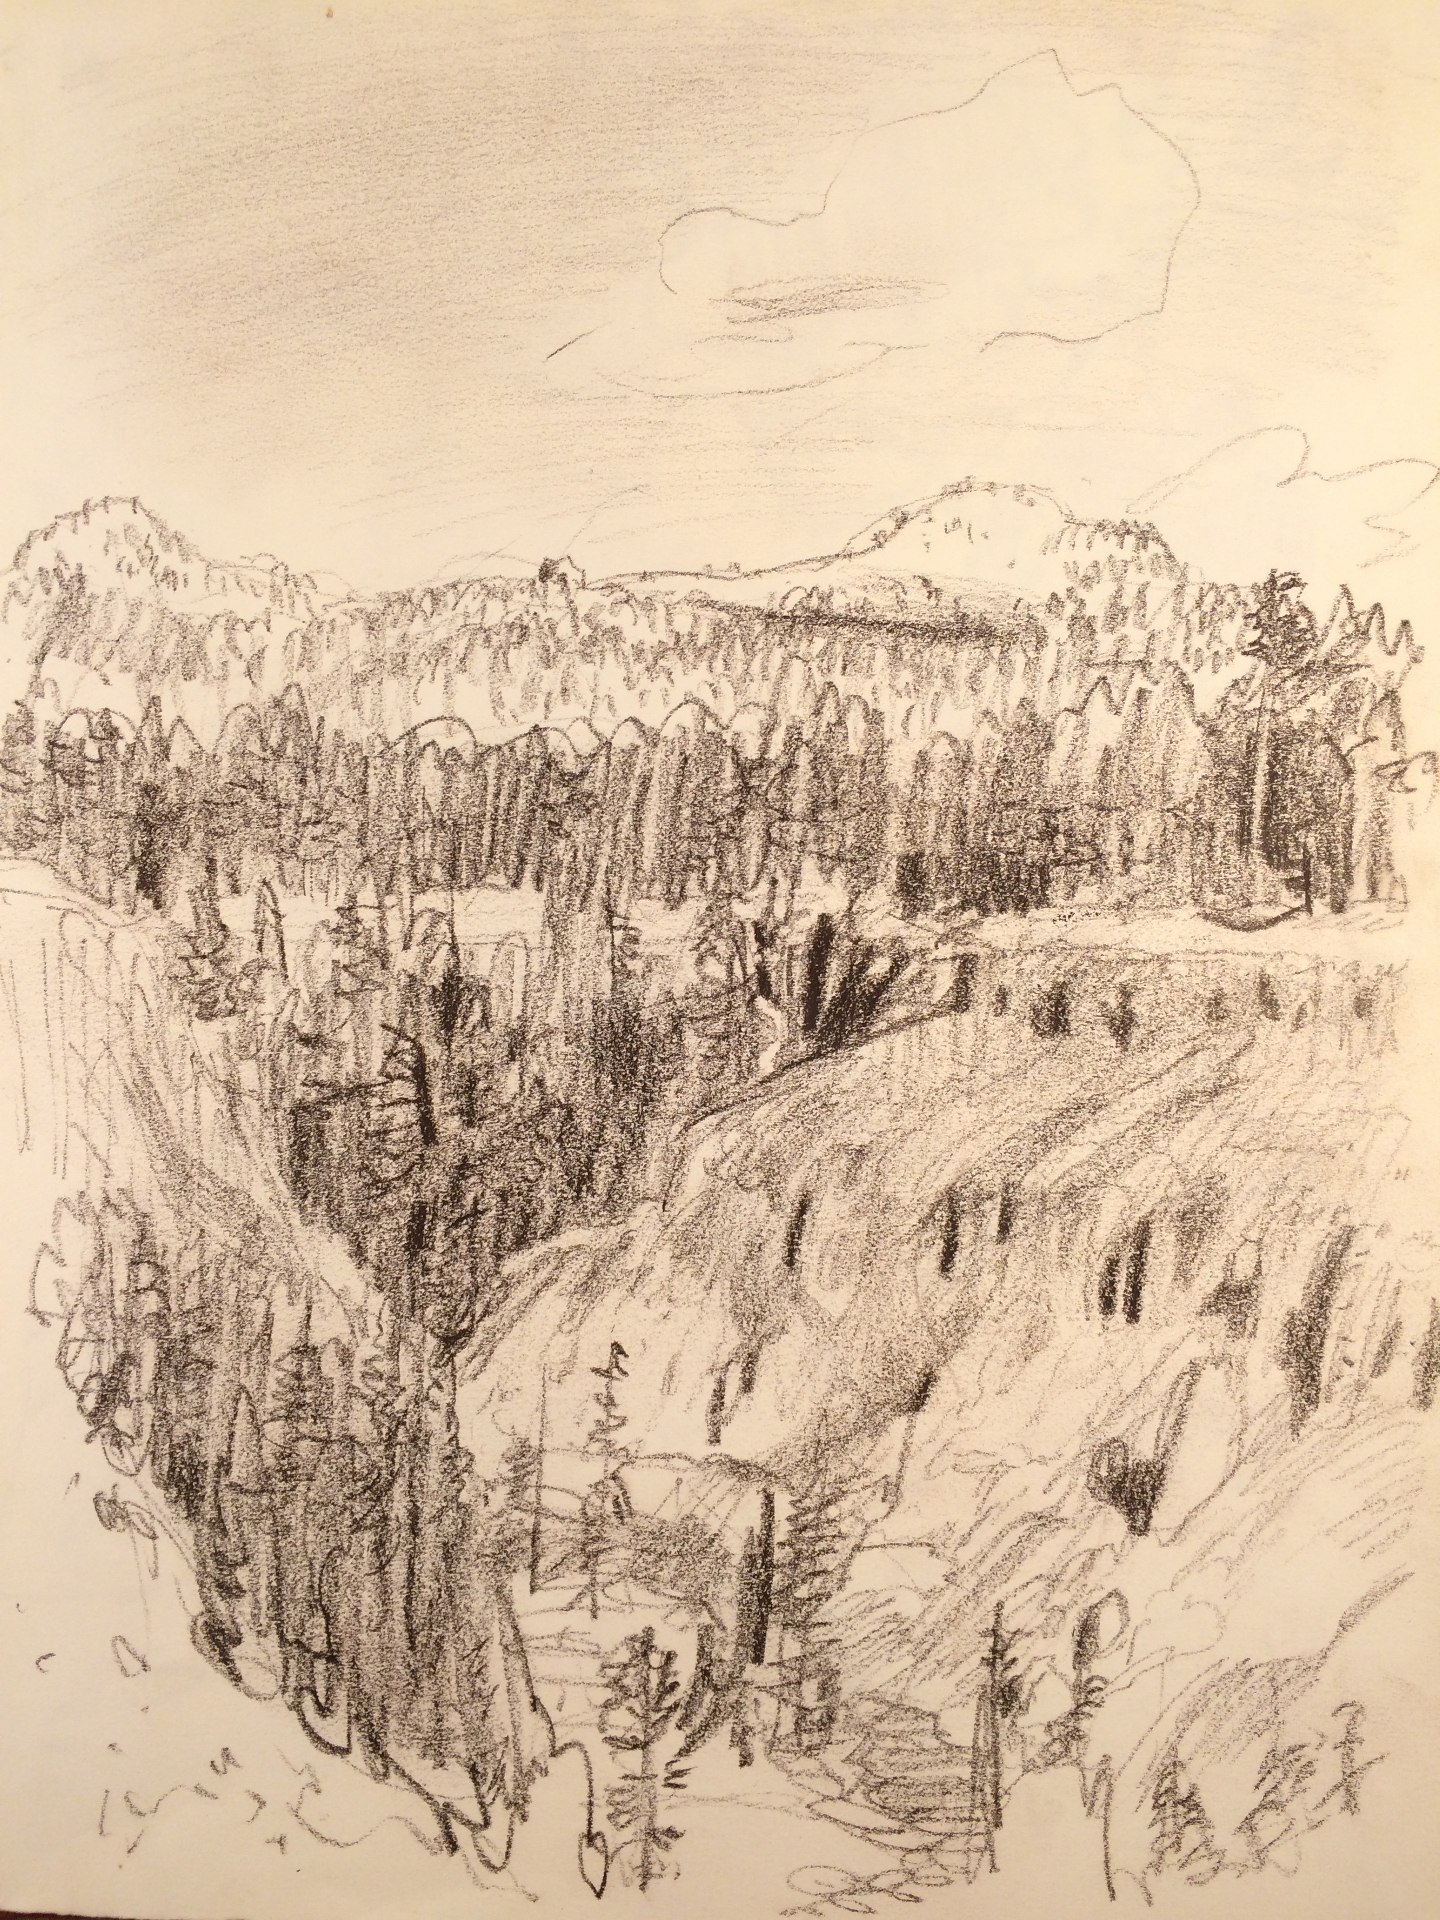 CLNP Annie's Creek drawing